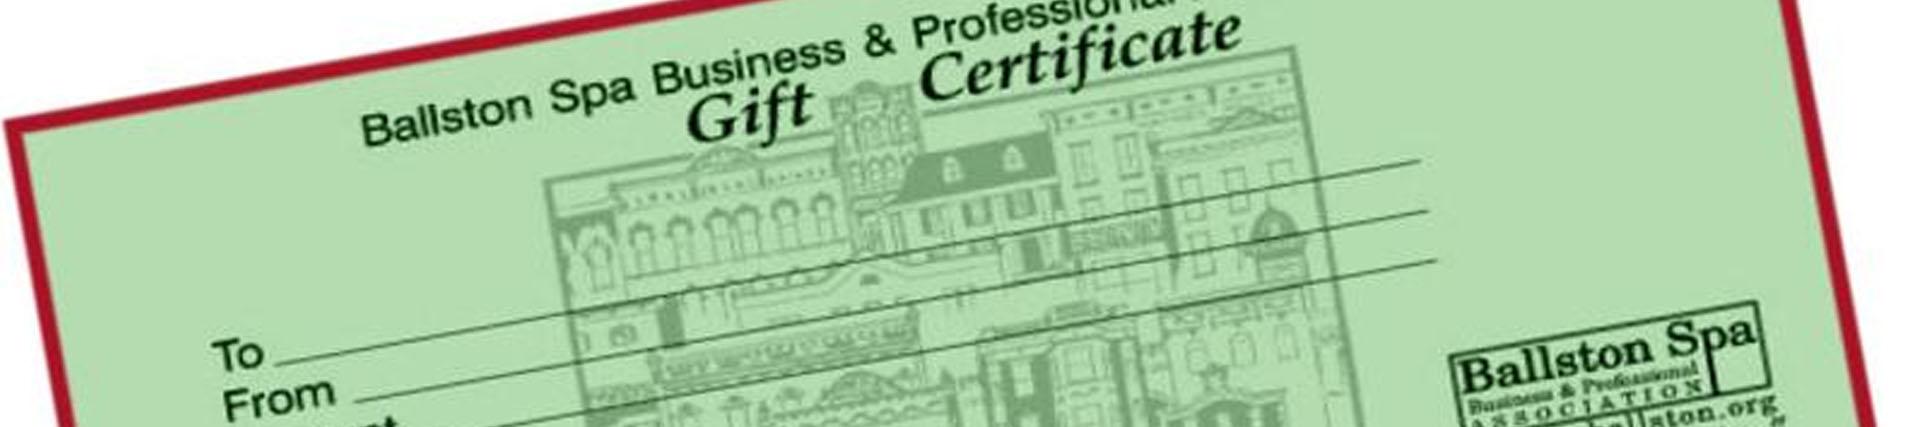 ballston spa gift certificates available at ballston spa national bank